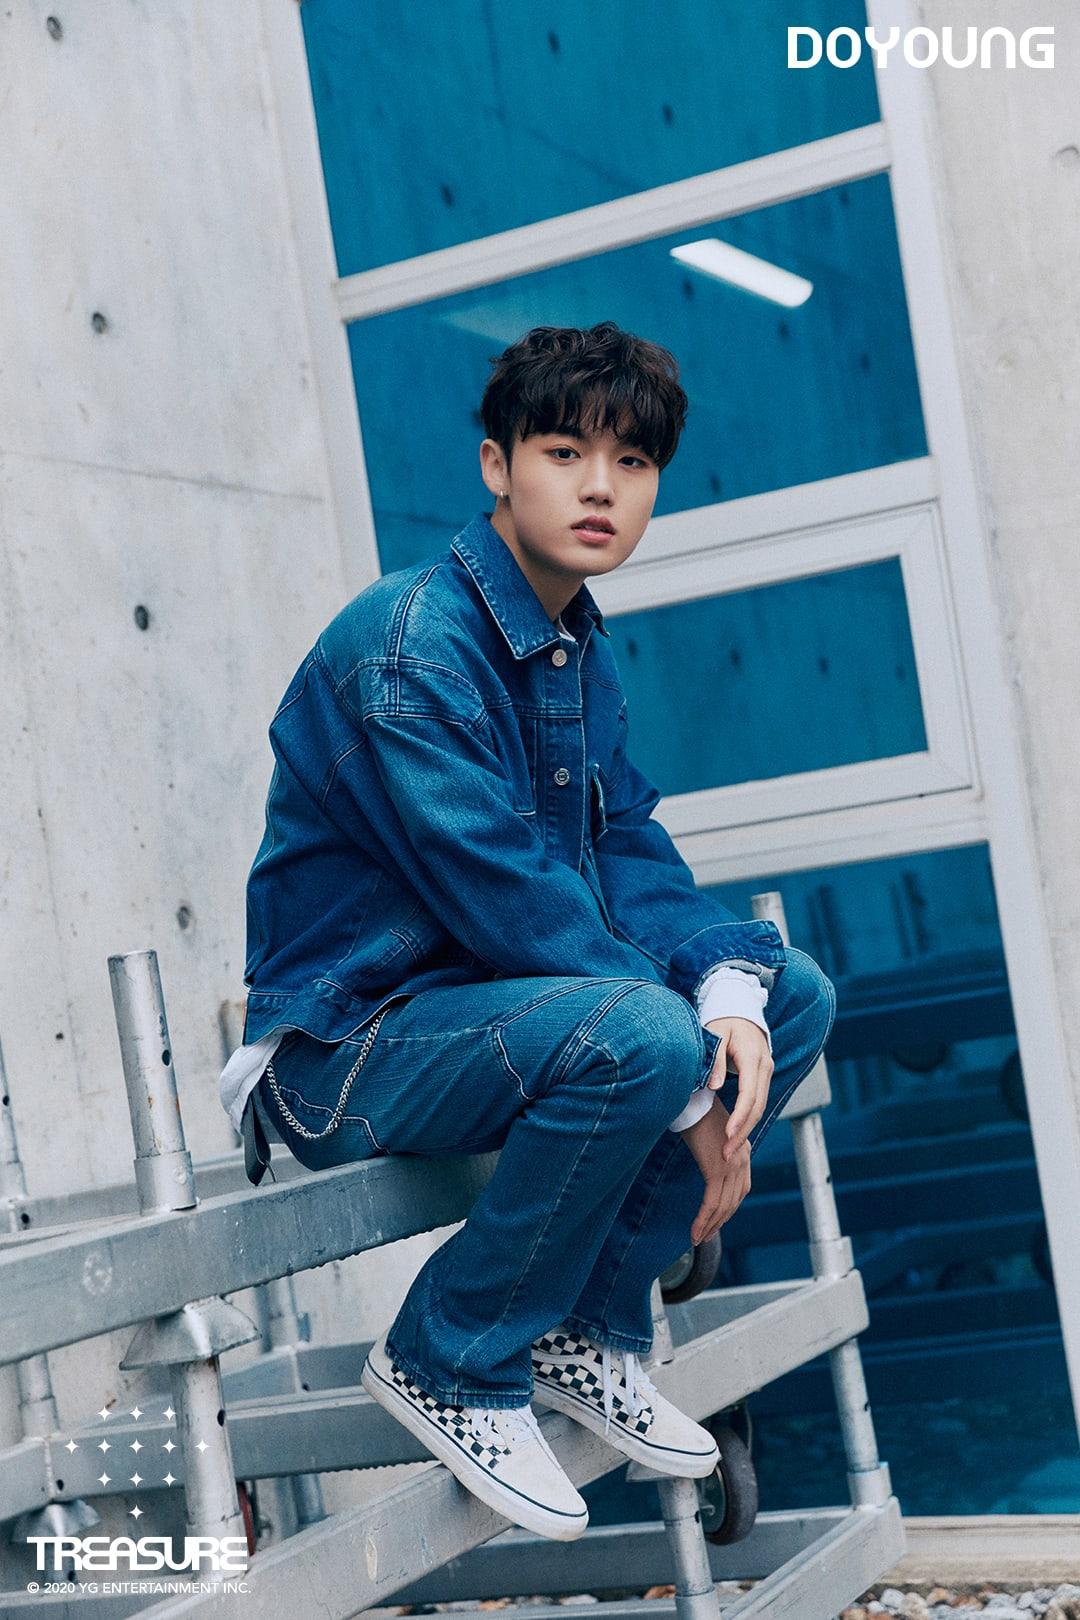 Update Treasure Shares New Group Photo Ahead Of Debut Soompi